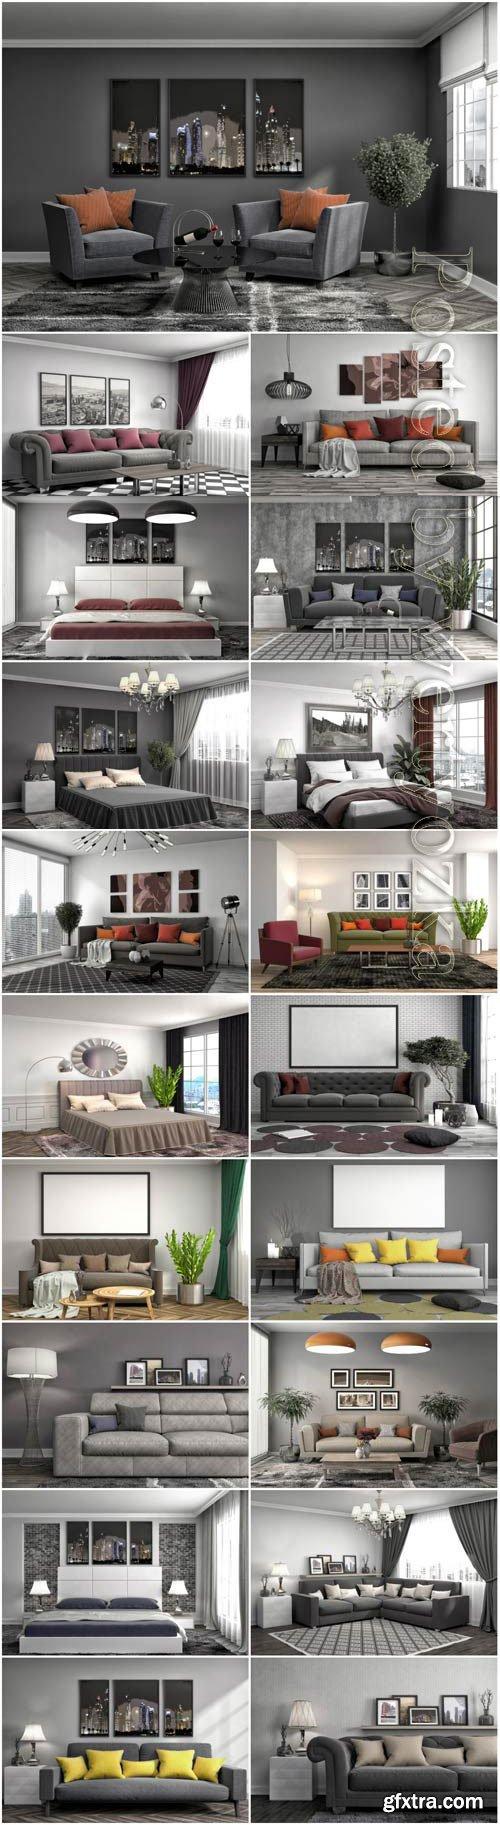 Modern interior in gray tones stock photo